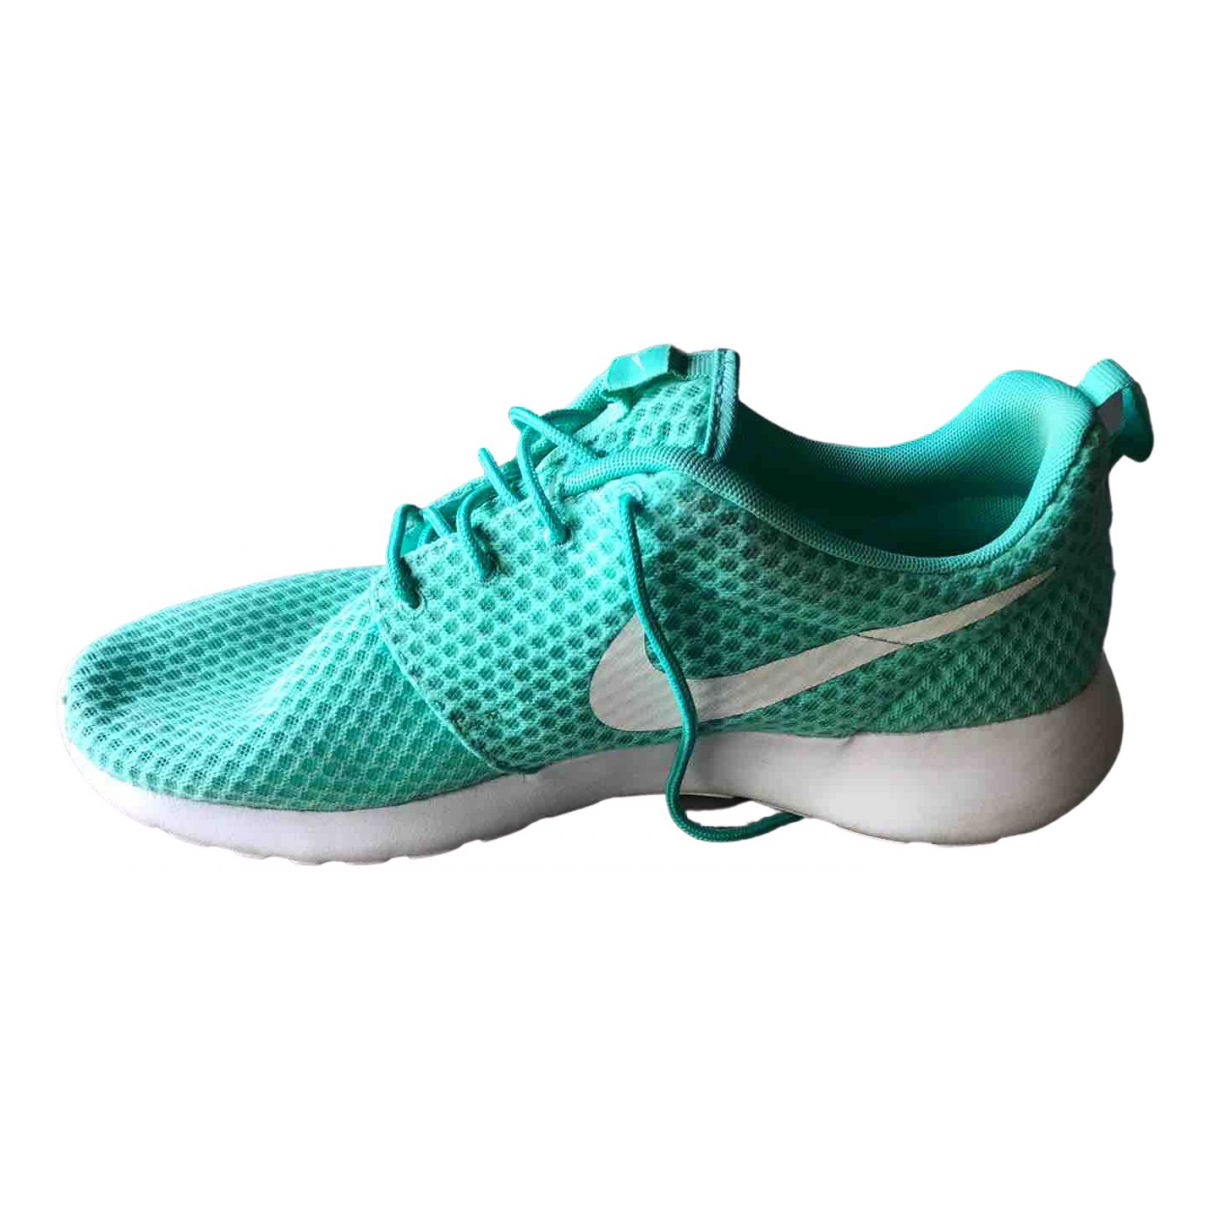 Nike Roshe Run Green Trainers for Men 45 EU